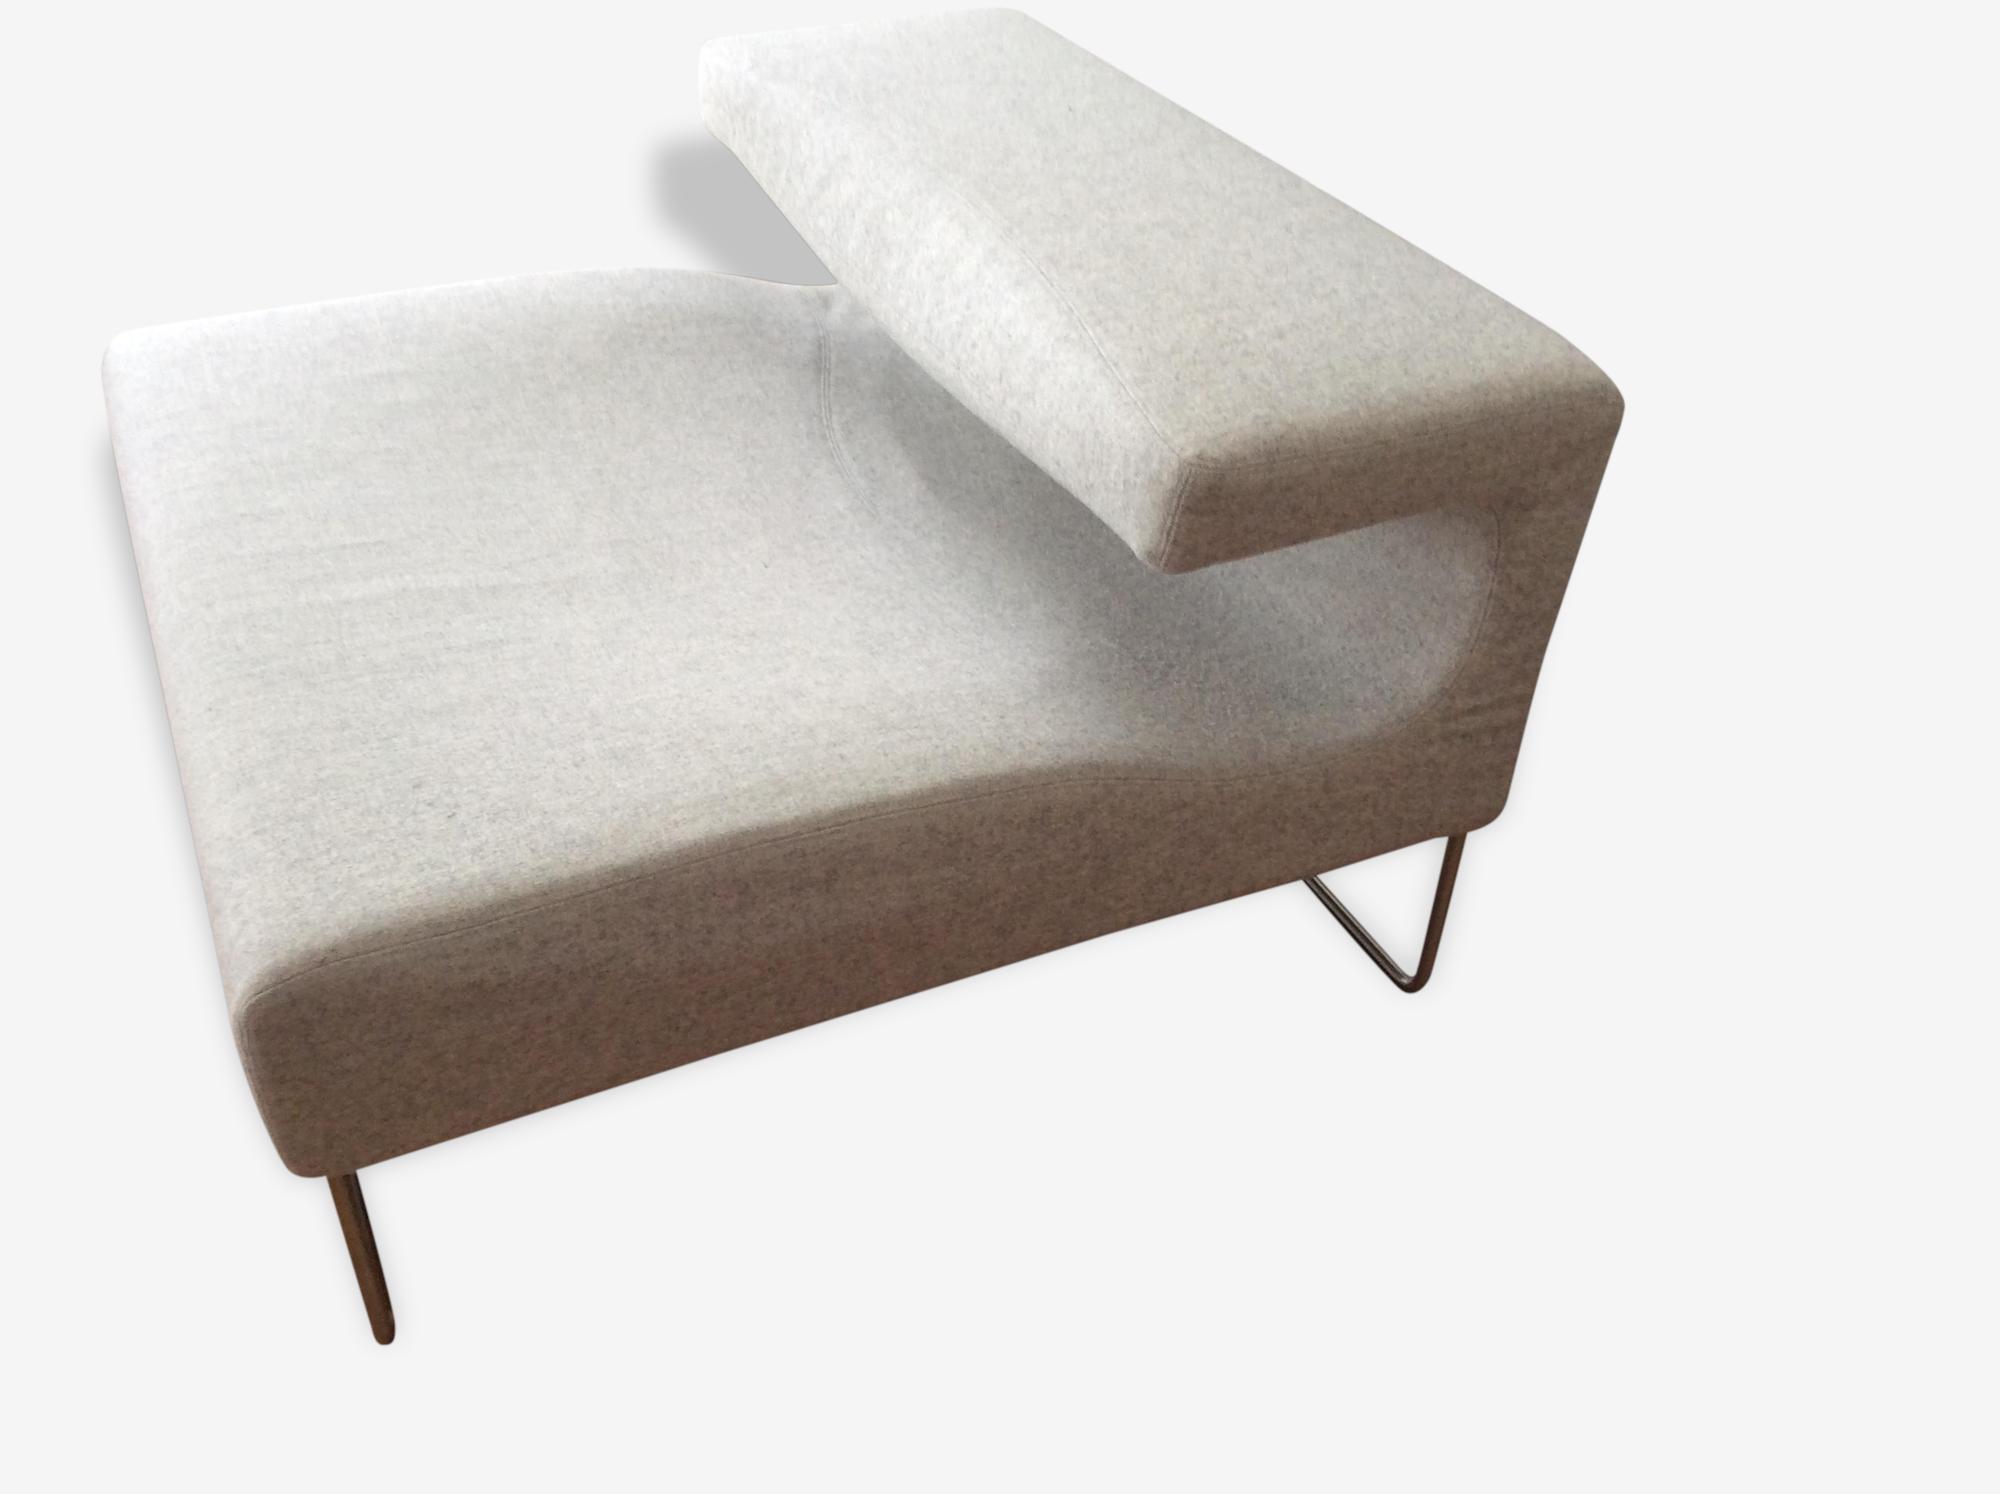 Seats En Sofas Reclame.Low Seat Moroso Fabric Grey Design 112588